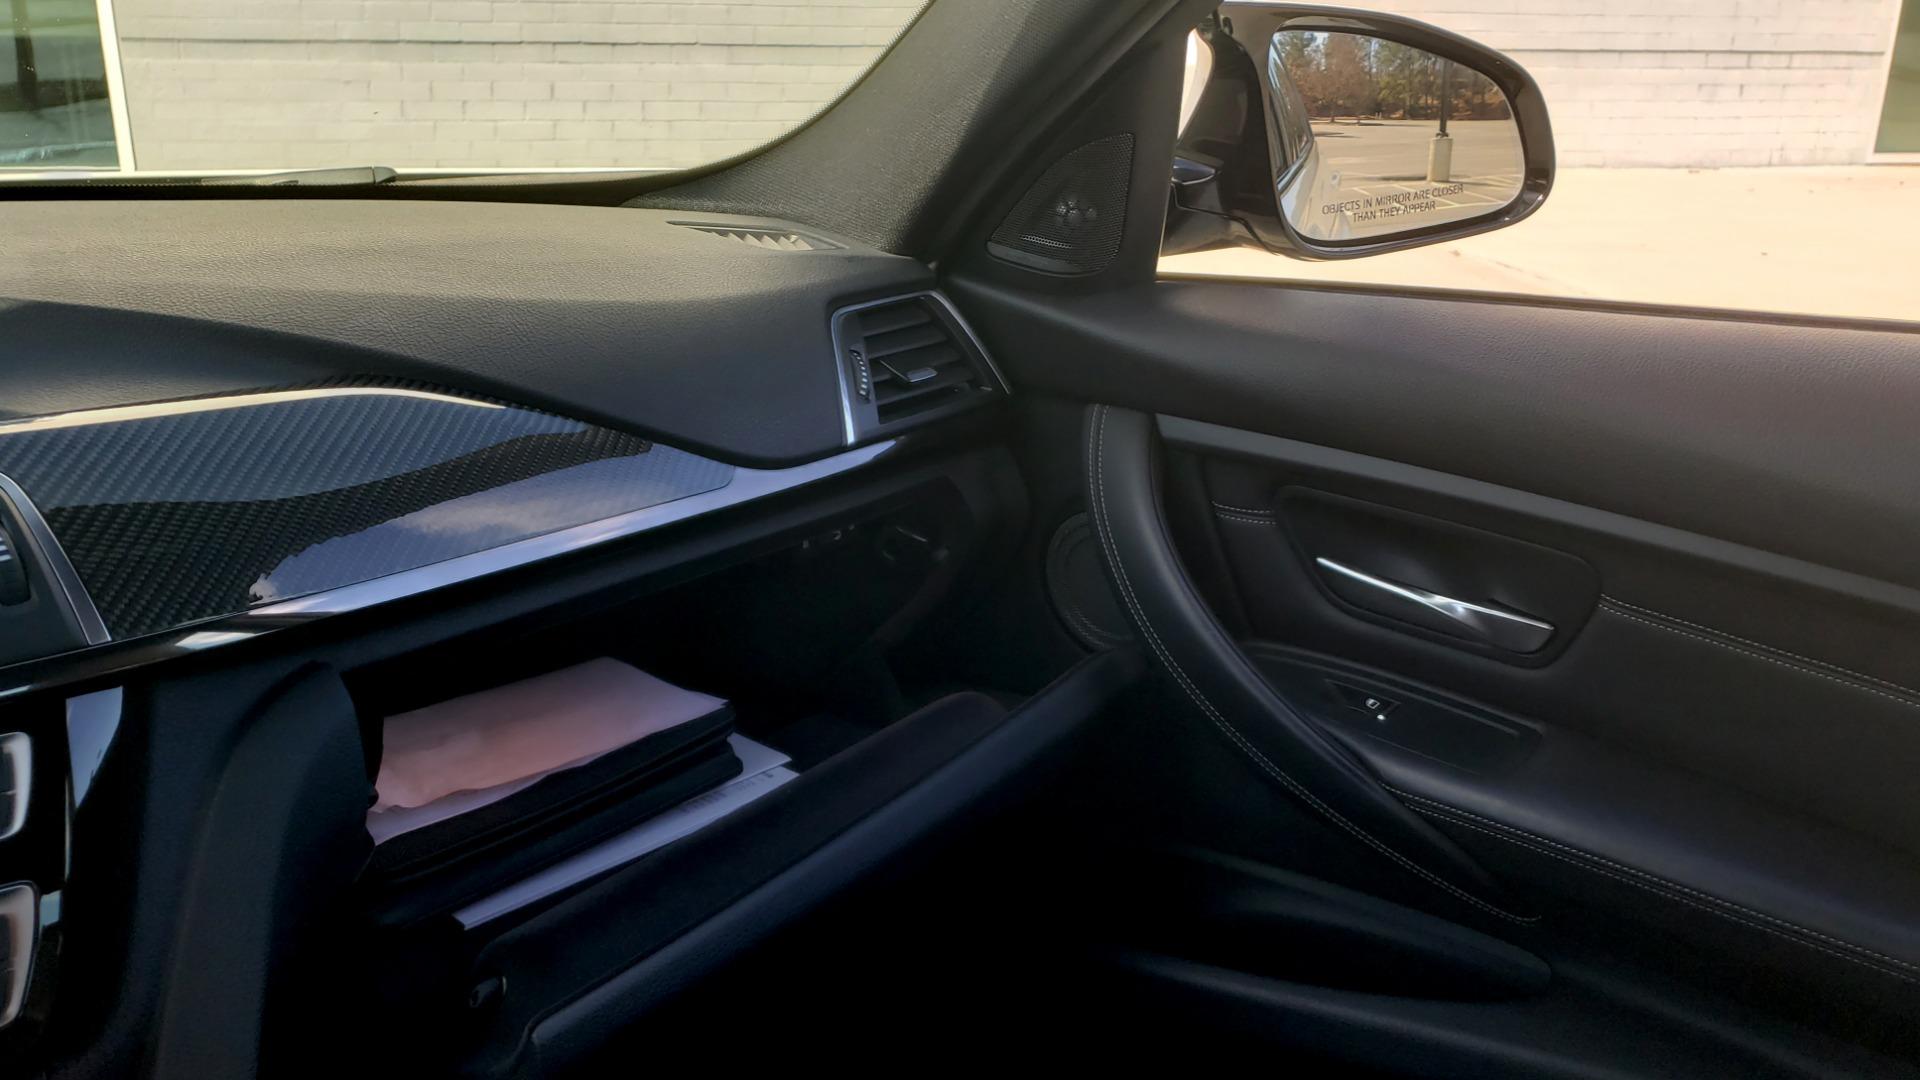 Used 2016 BMW M3 SEDAN / EXECUTIVE PKG / M-SUSPENSION / HARMAN/KARDON SOUND for sale Sold at Formula Imports in Charlotte NC 28227 60